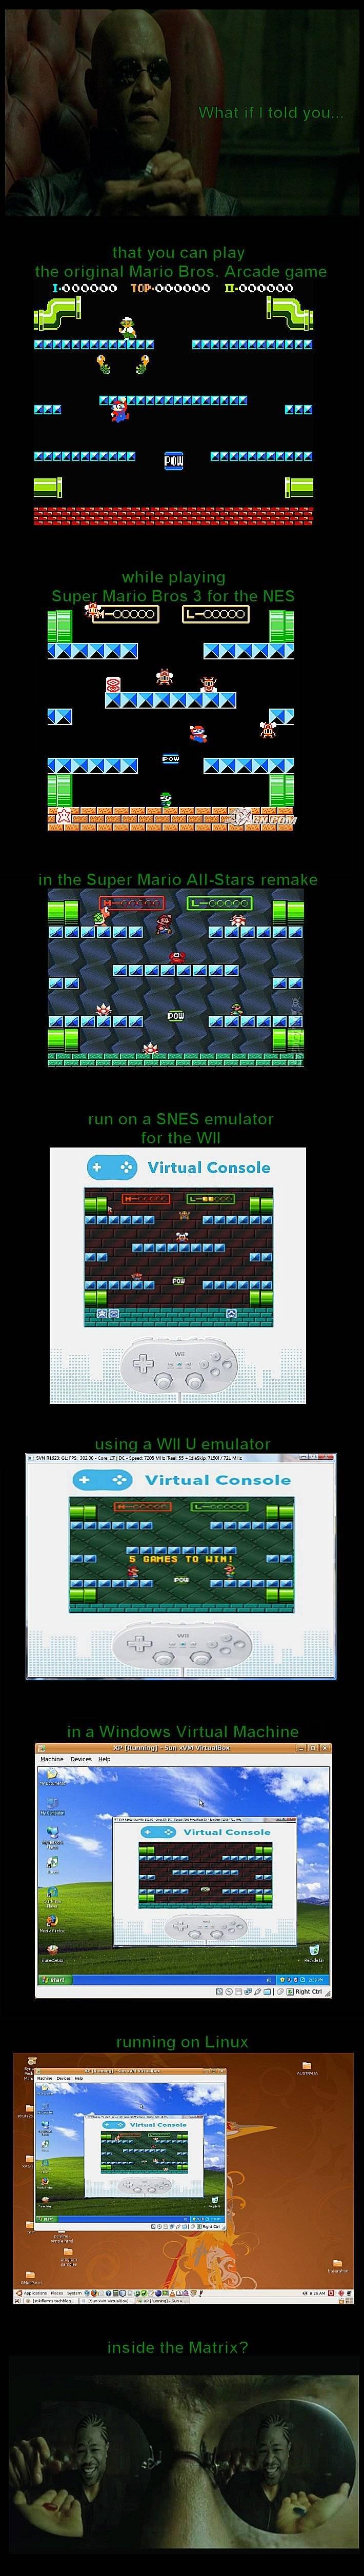 So I Heard that you like Emulators.... . Ett, EEO EEO iei Eiio? mimejr